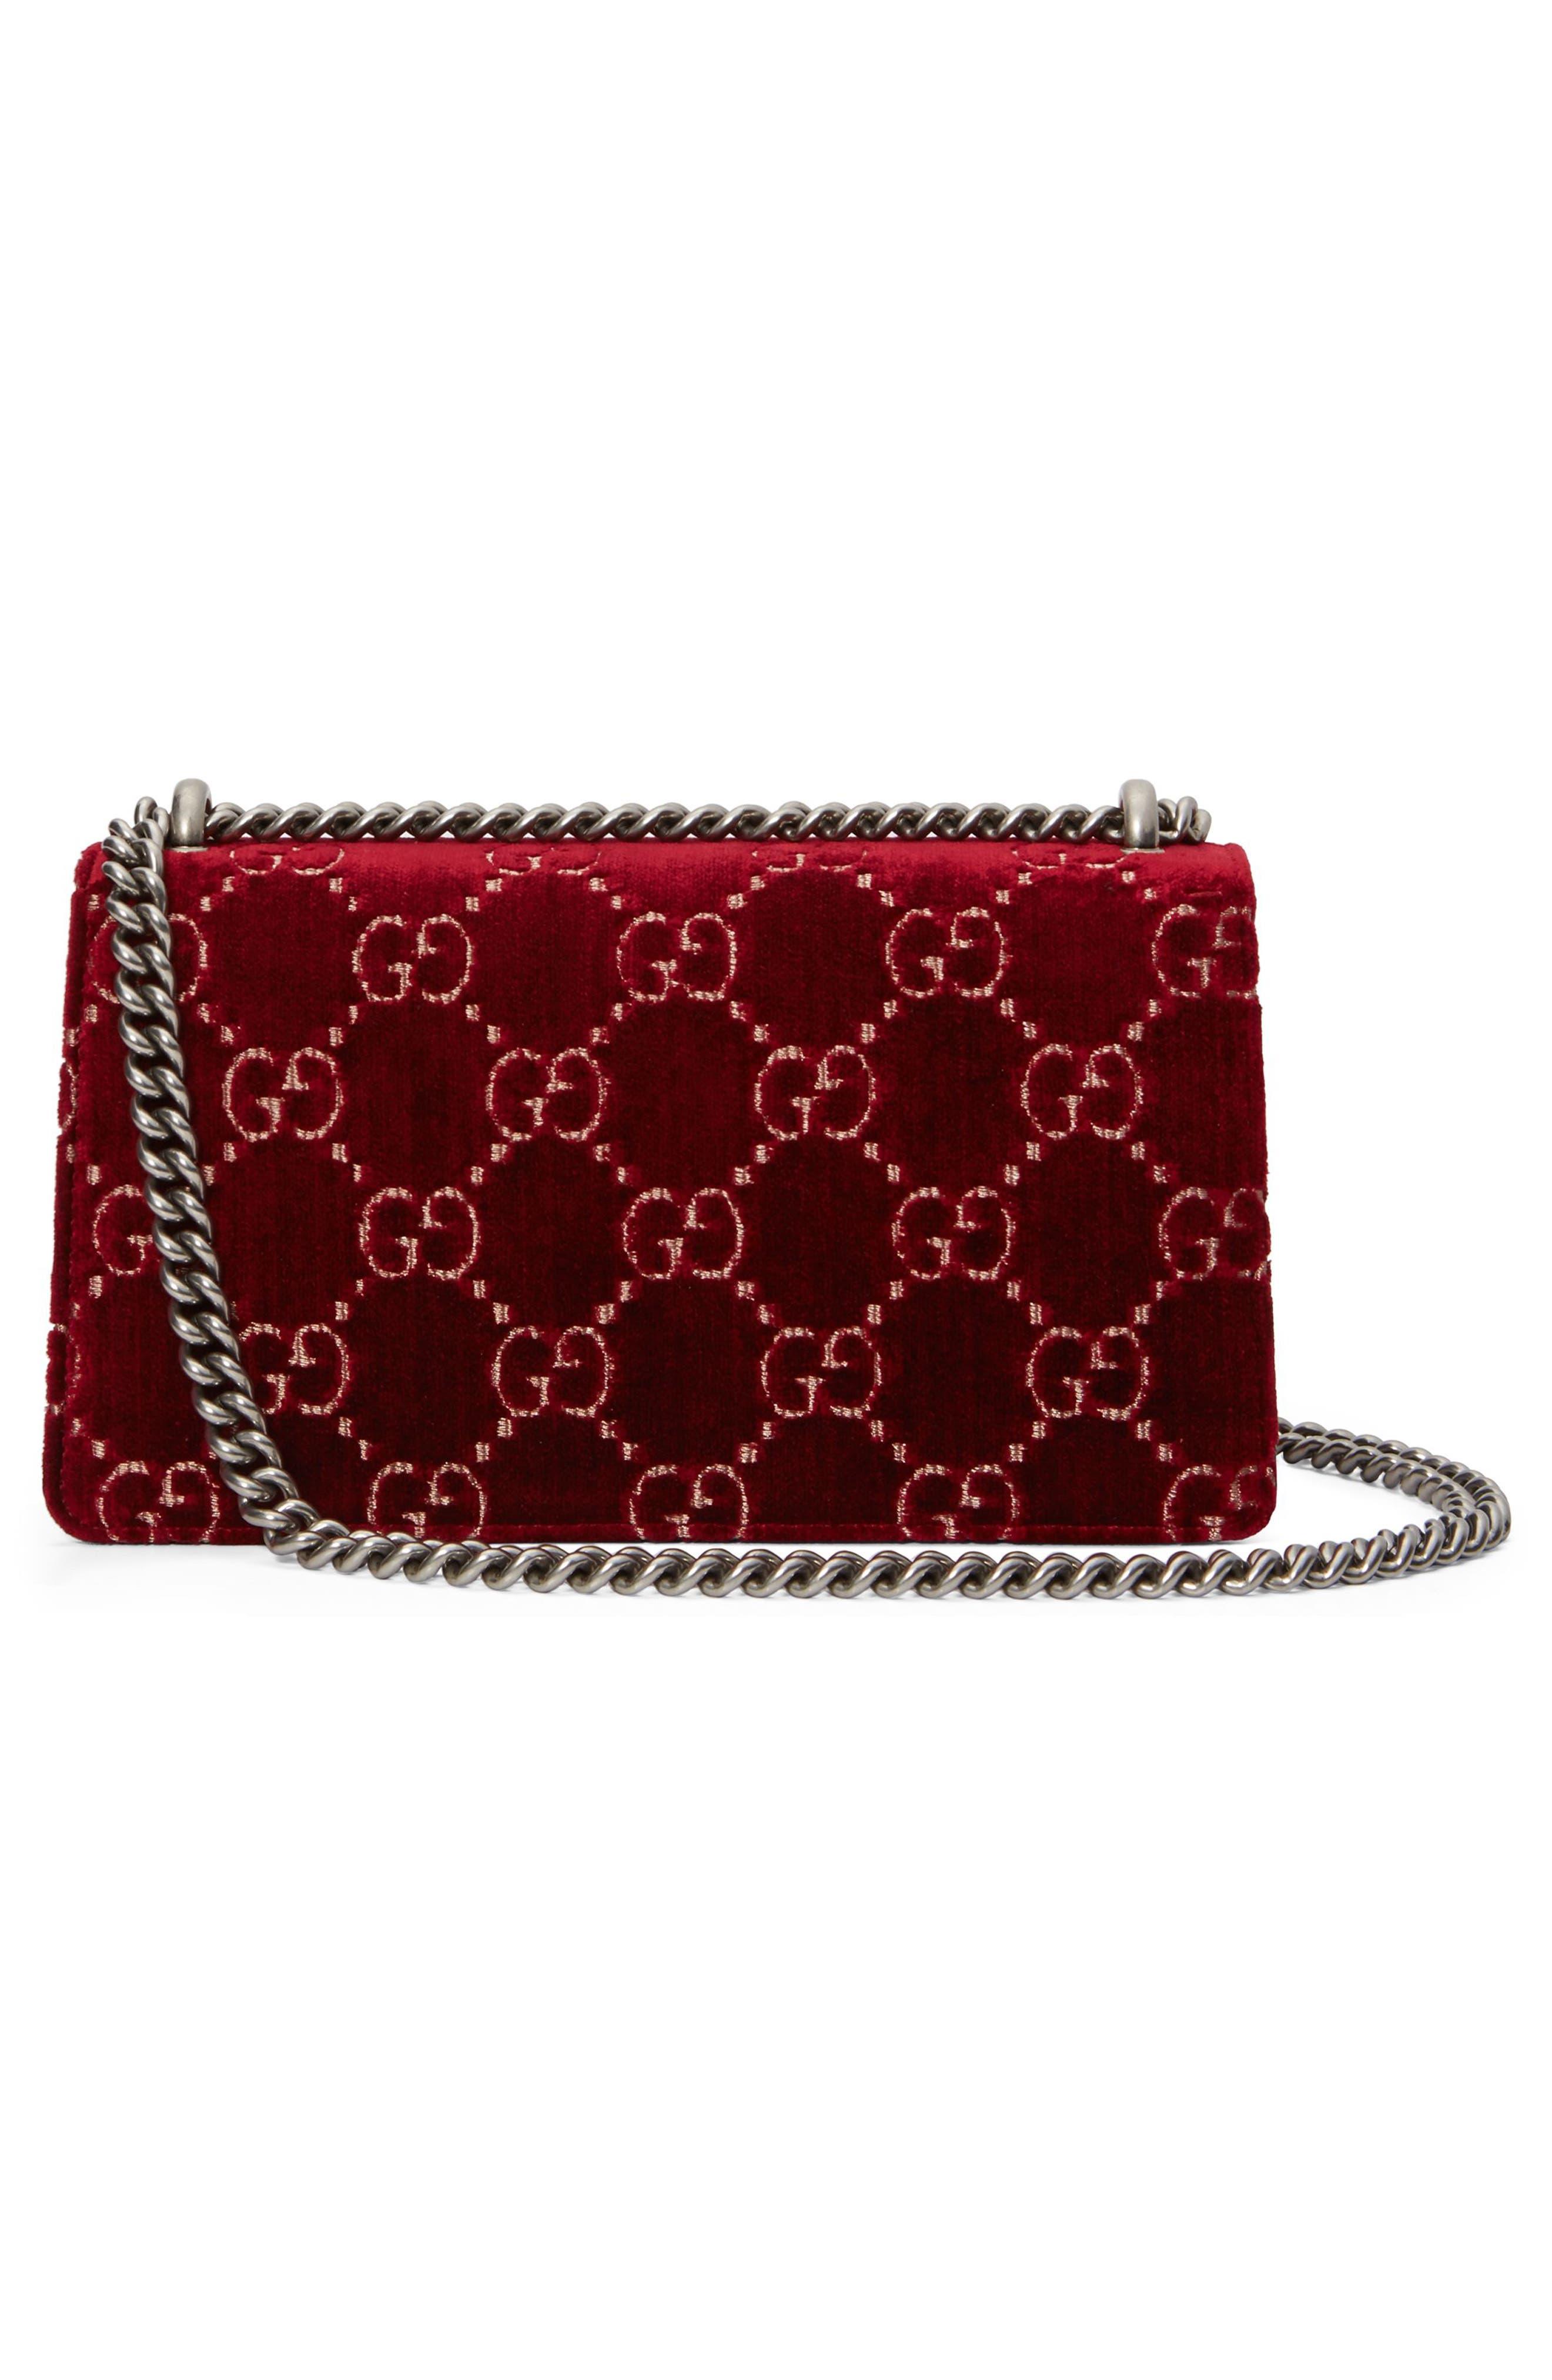 Small Dionysus GG Velvet Shoulder Bag,                             Alternate thumbnail 2, color,                             Red Cipria/ Black Diamond